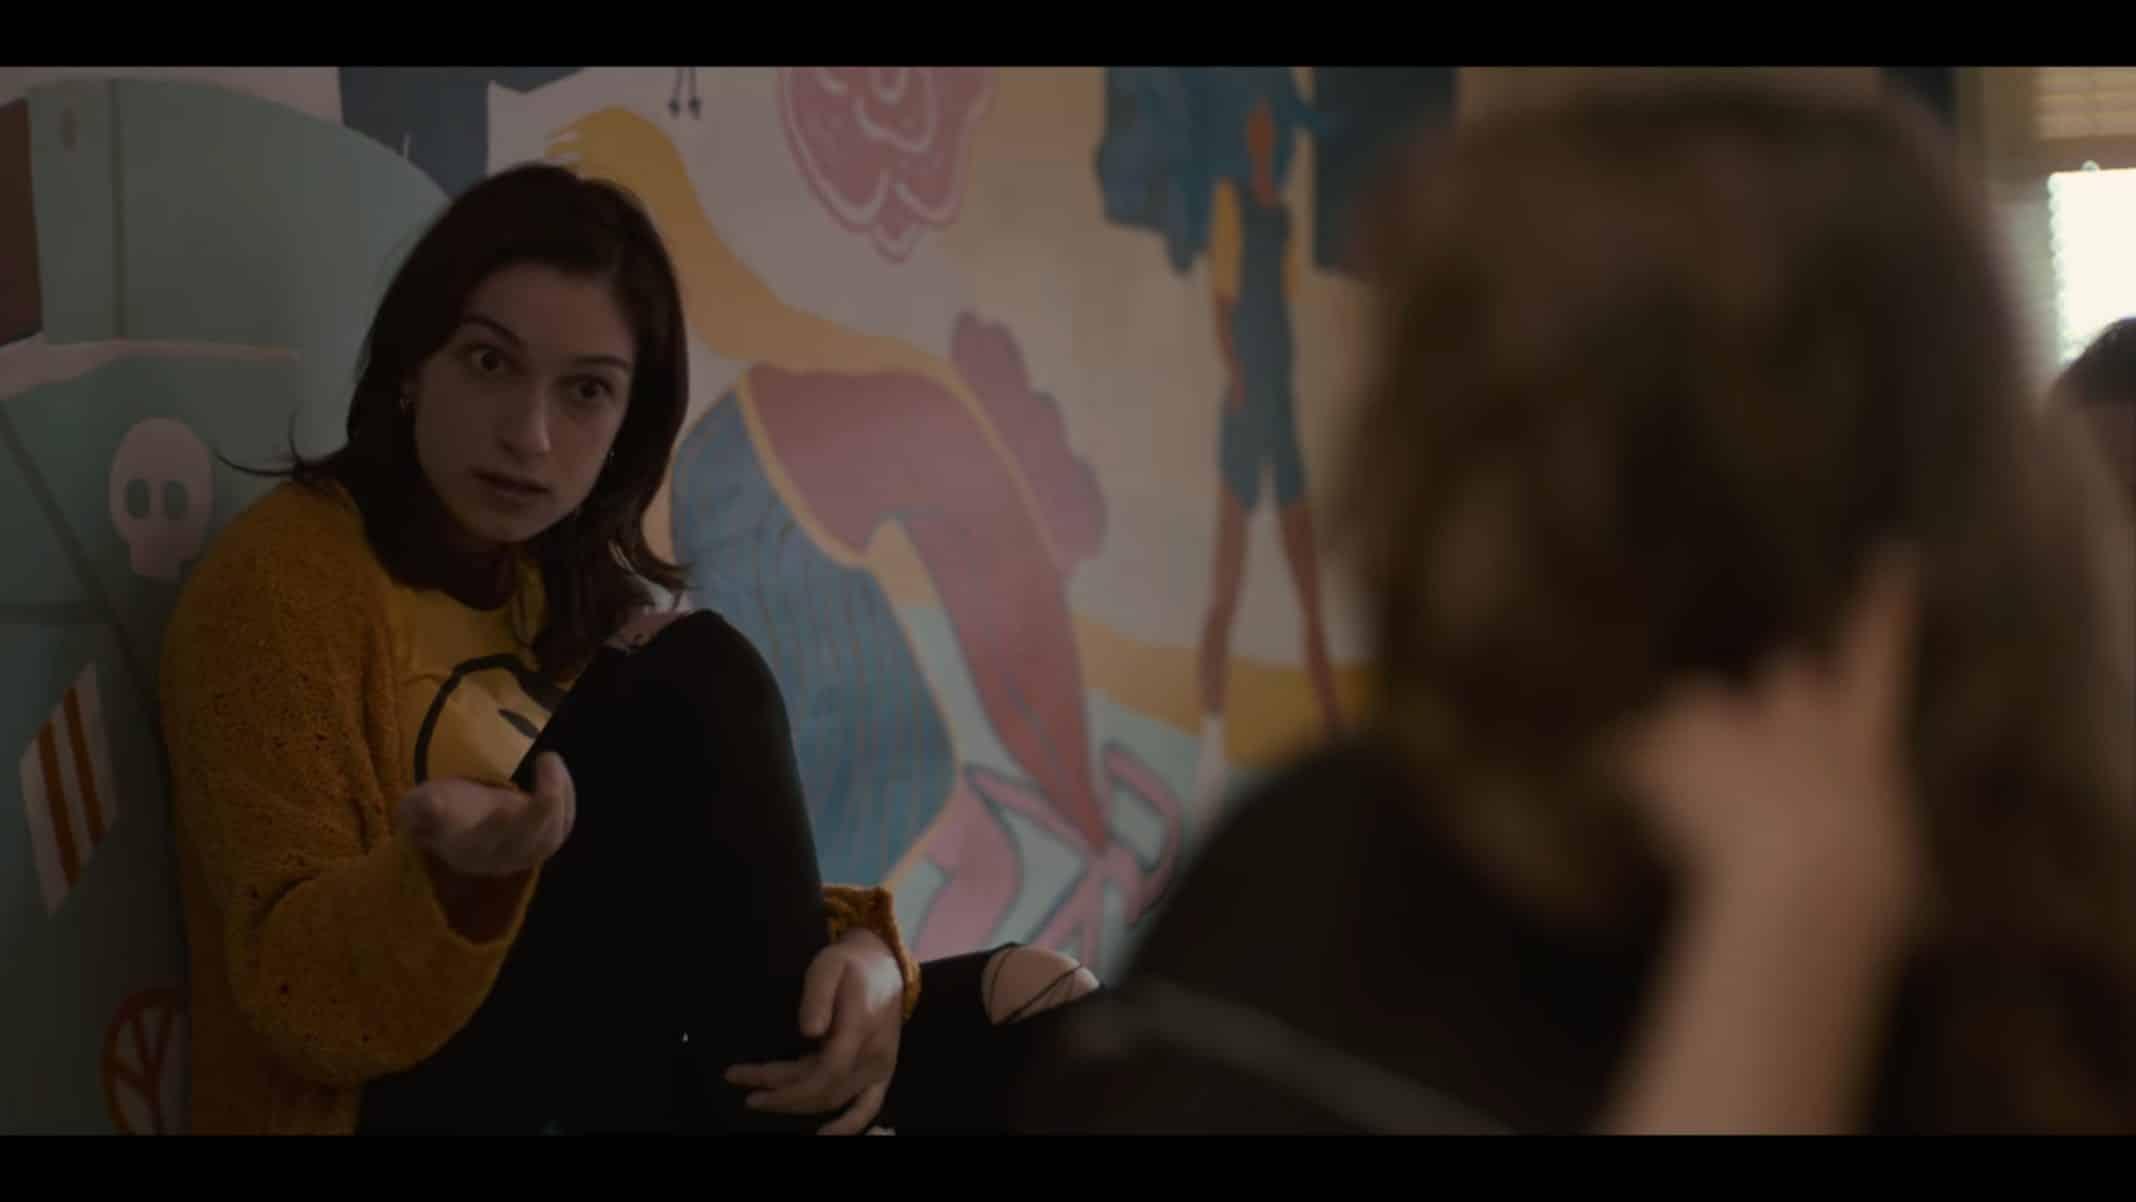 Anna (Sydney Meyer) pressuring Joey to eat a jellybean